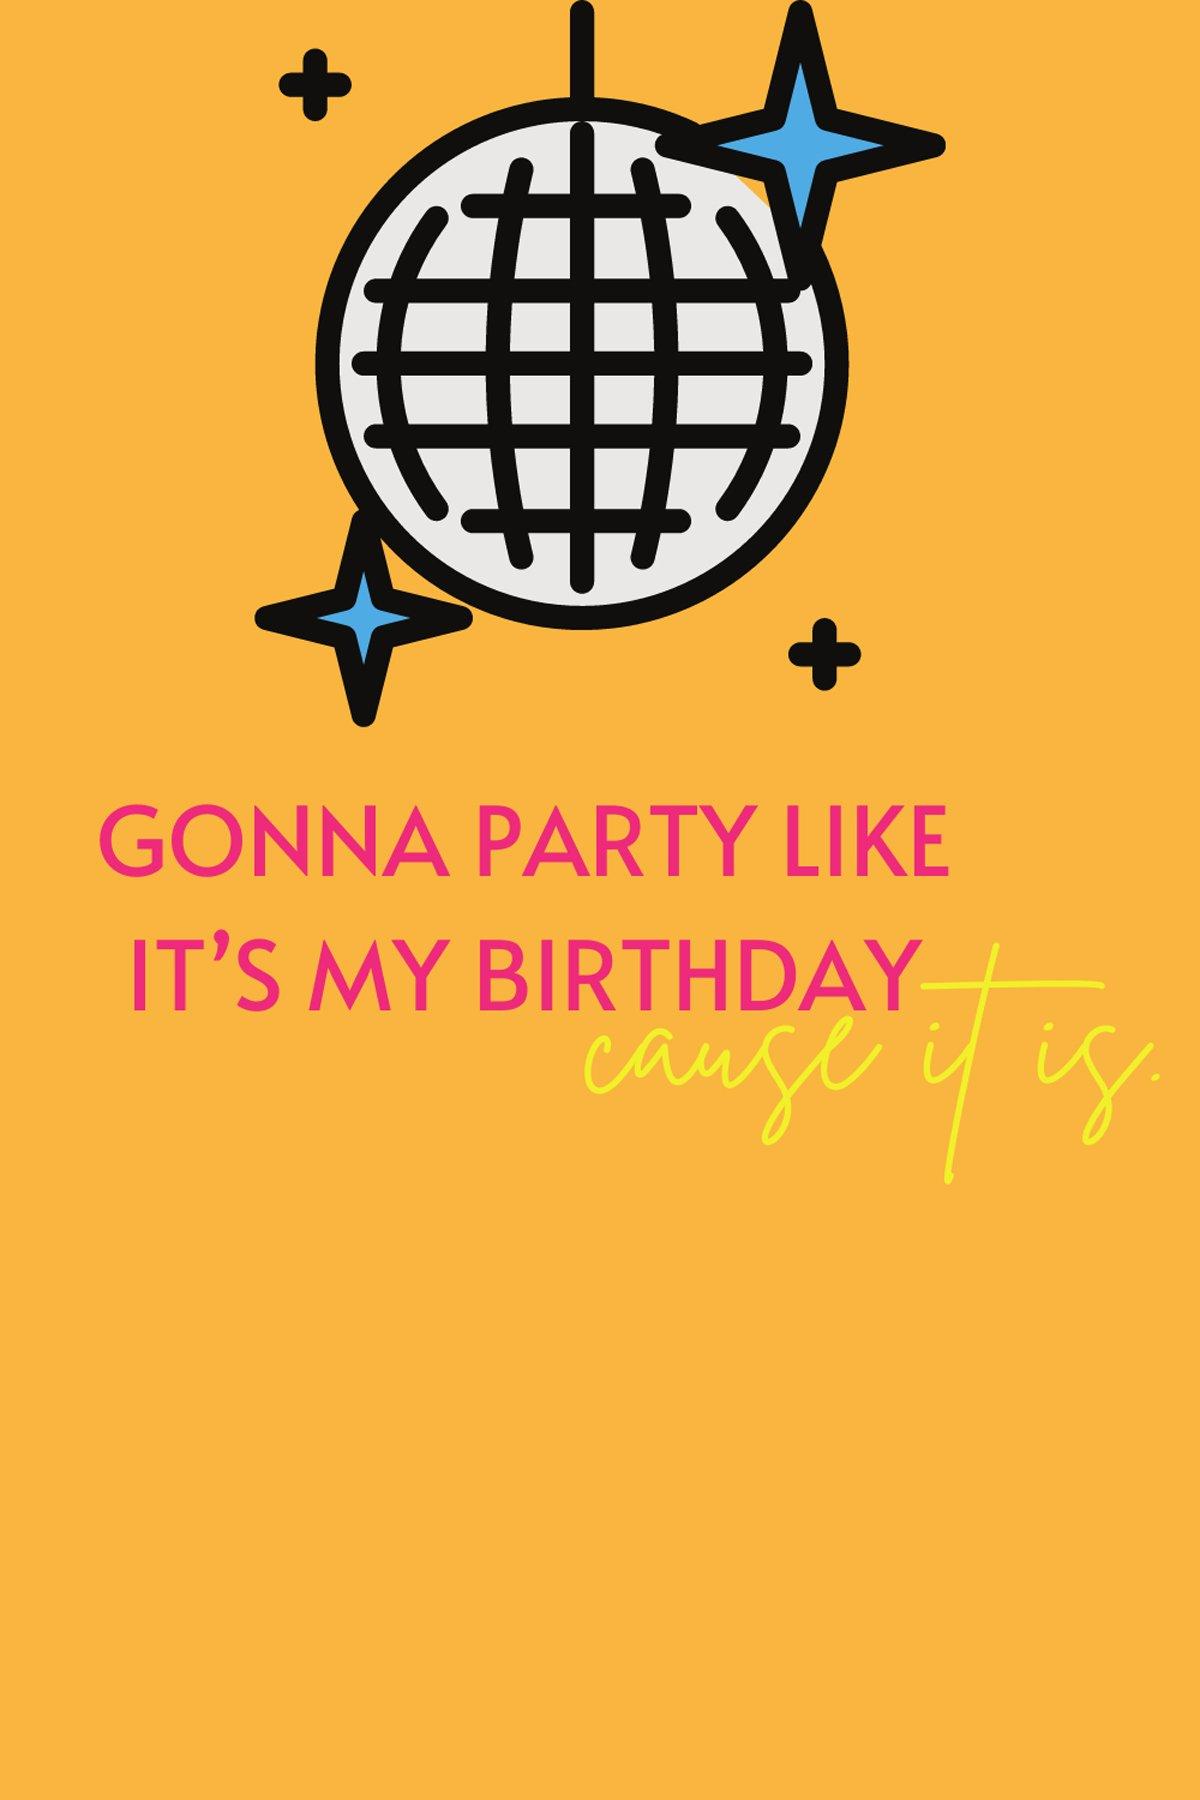 Birthday Party Quotes